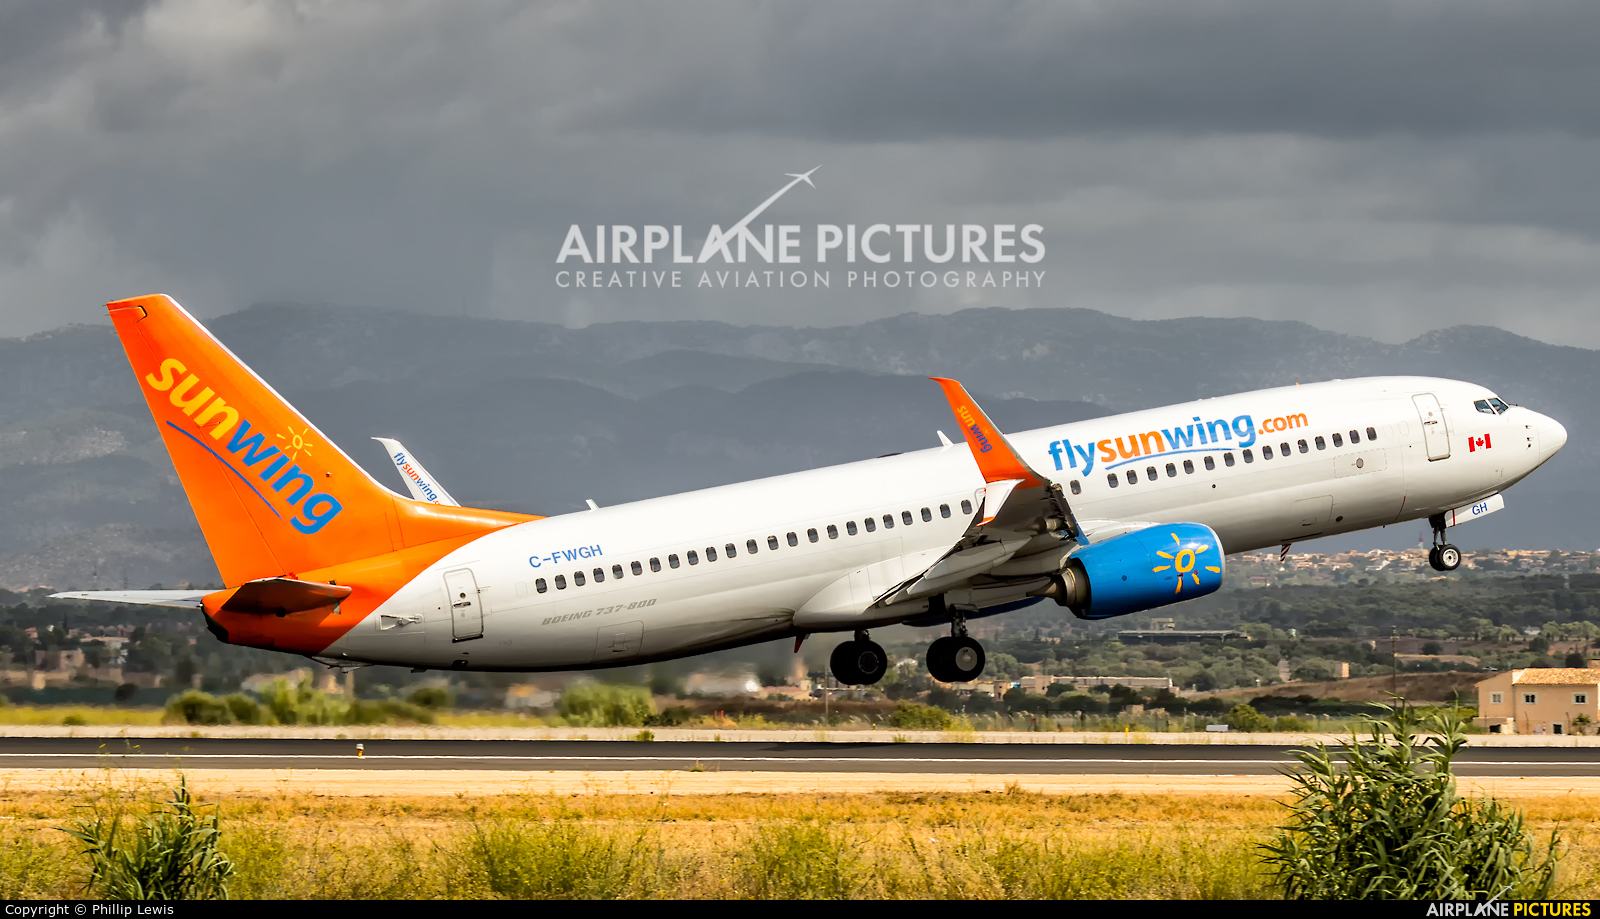 Sunwing Airlines C-FWGH aircraft at Palma de Mallorca